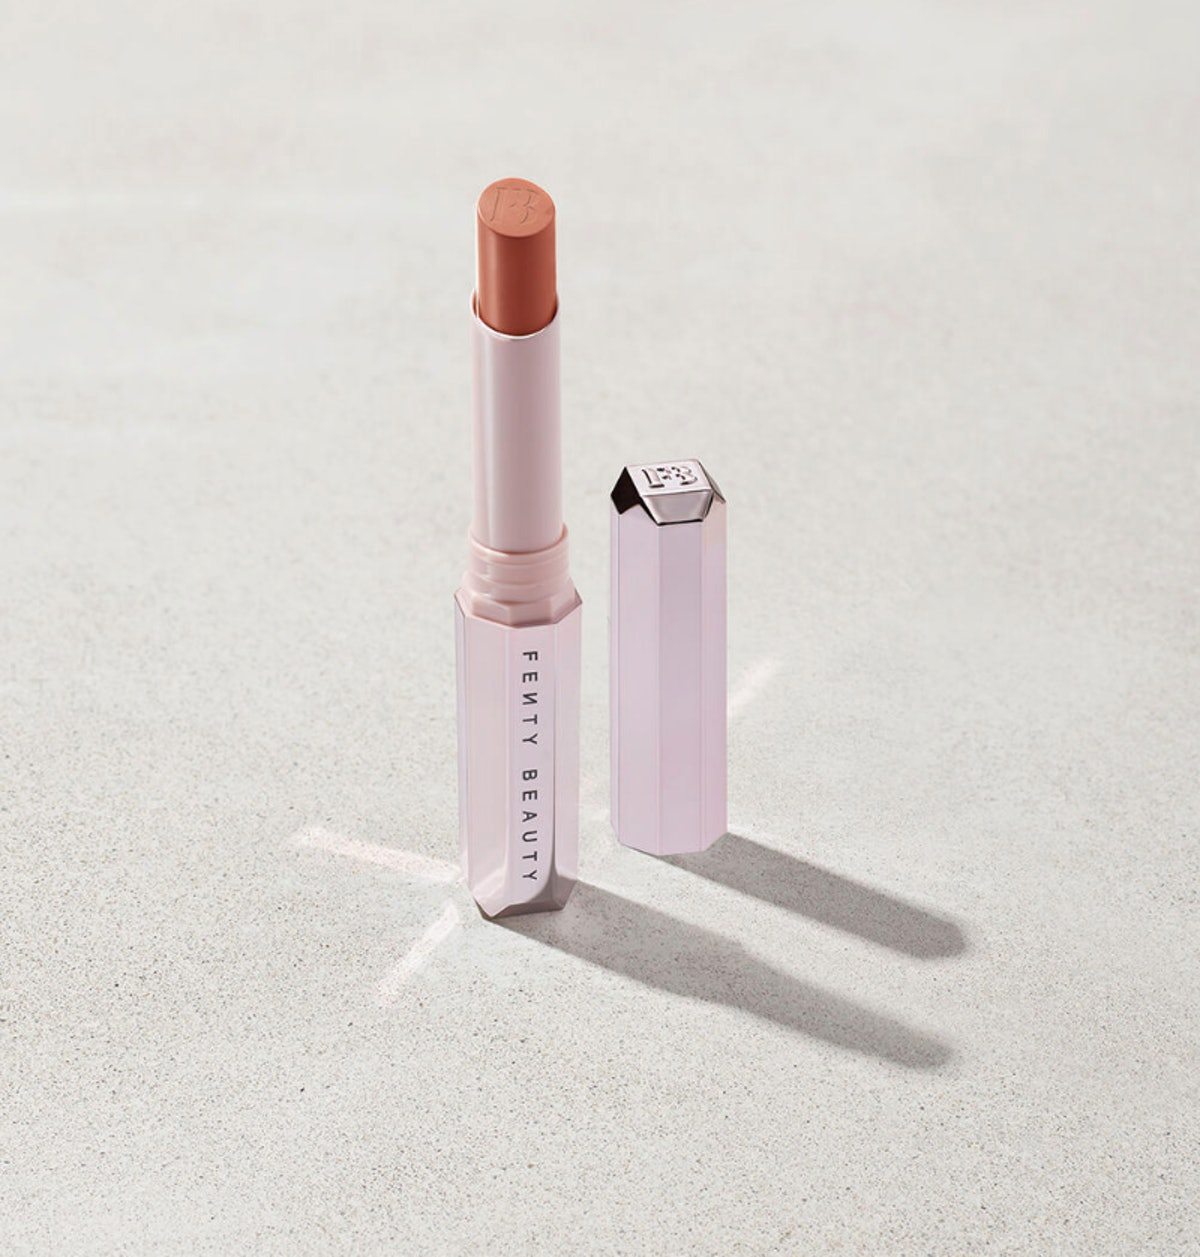 Mattemoiselle Plush Matte Lipstick in S1NGLE